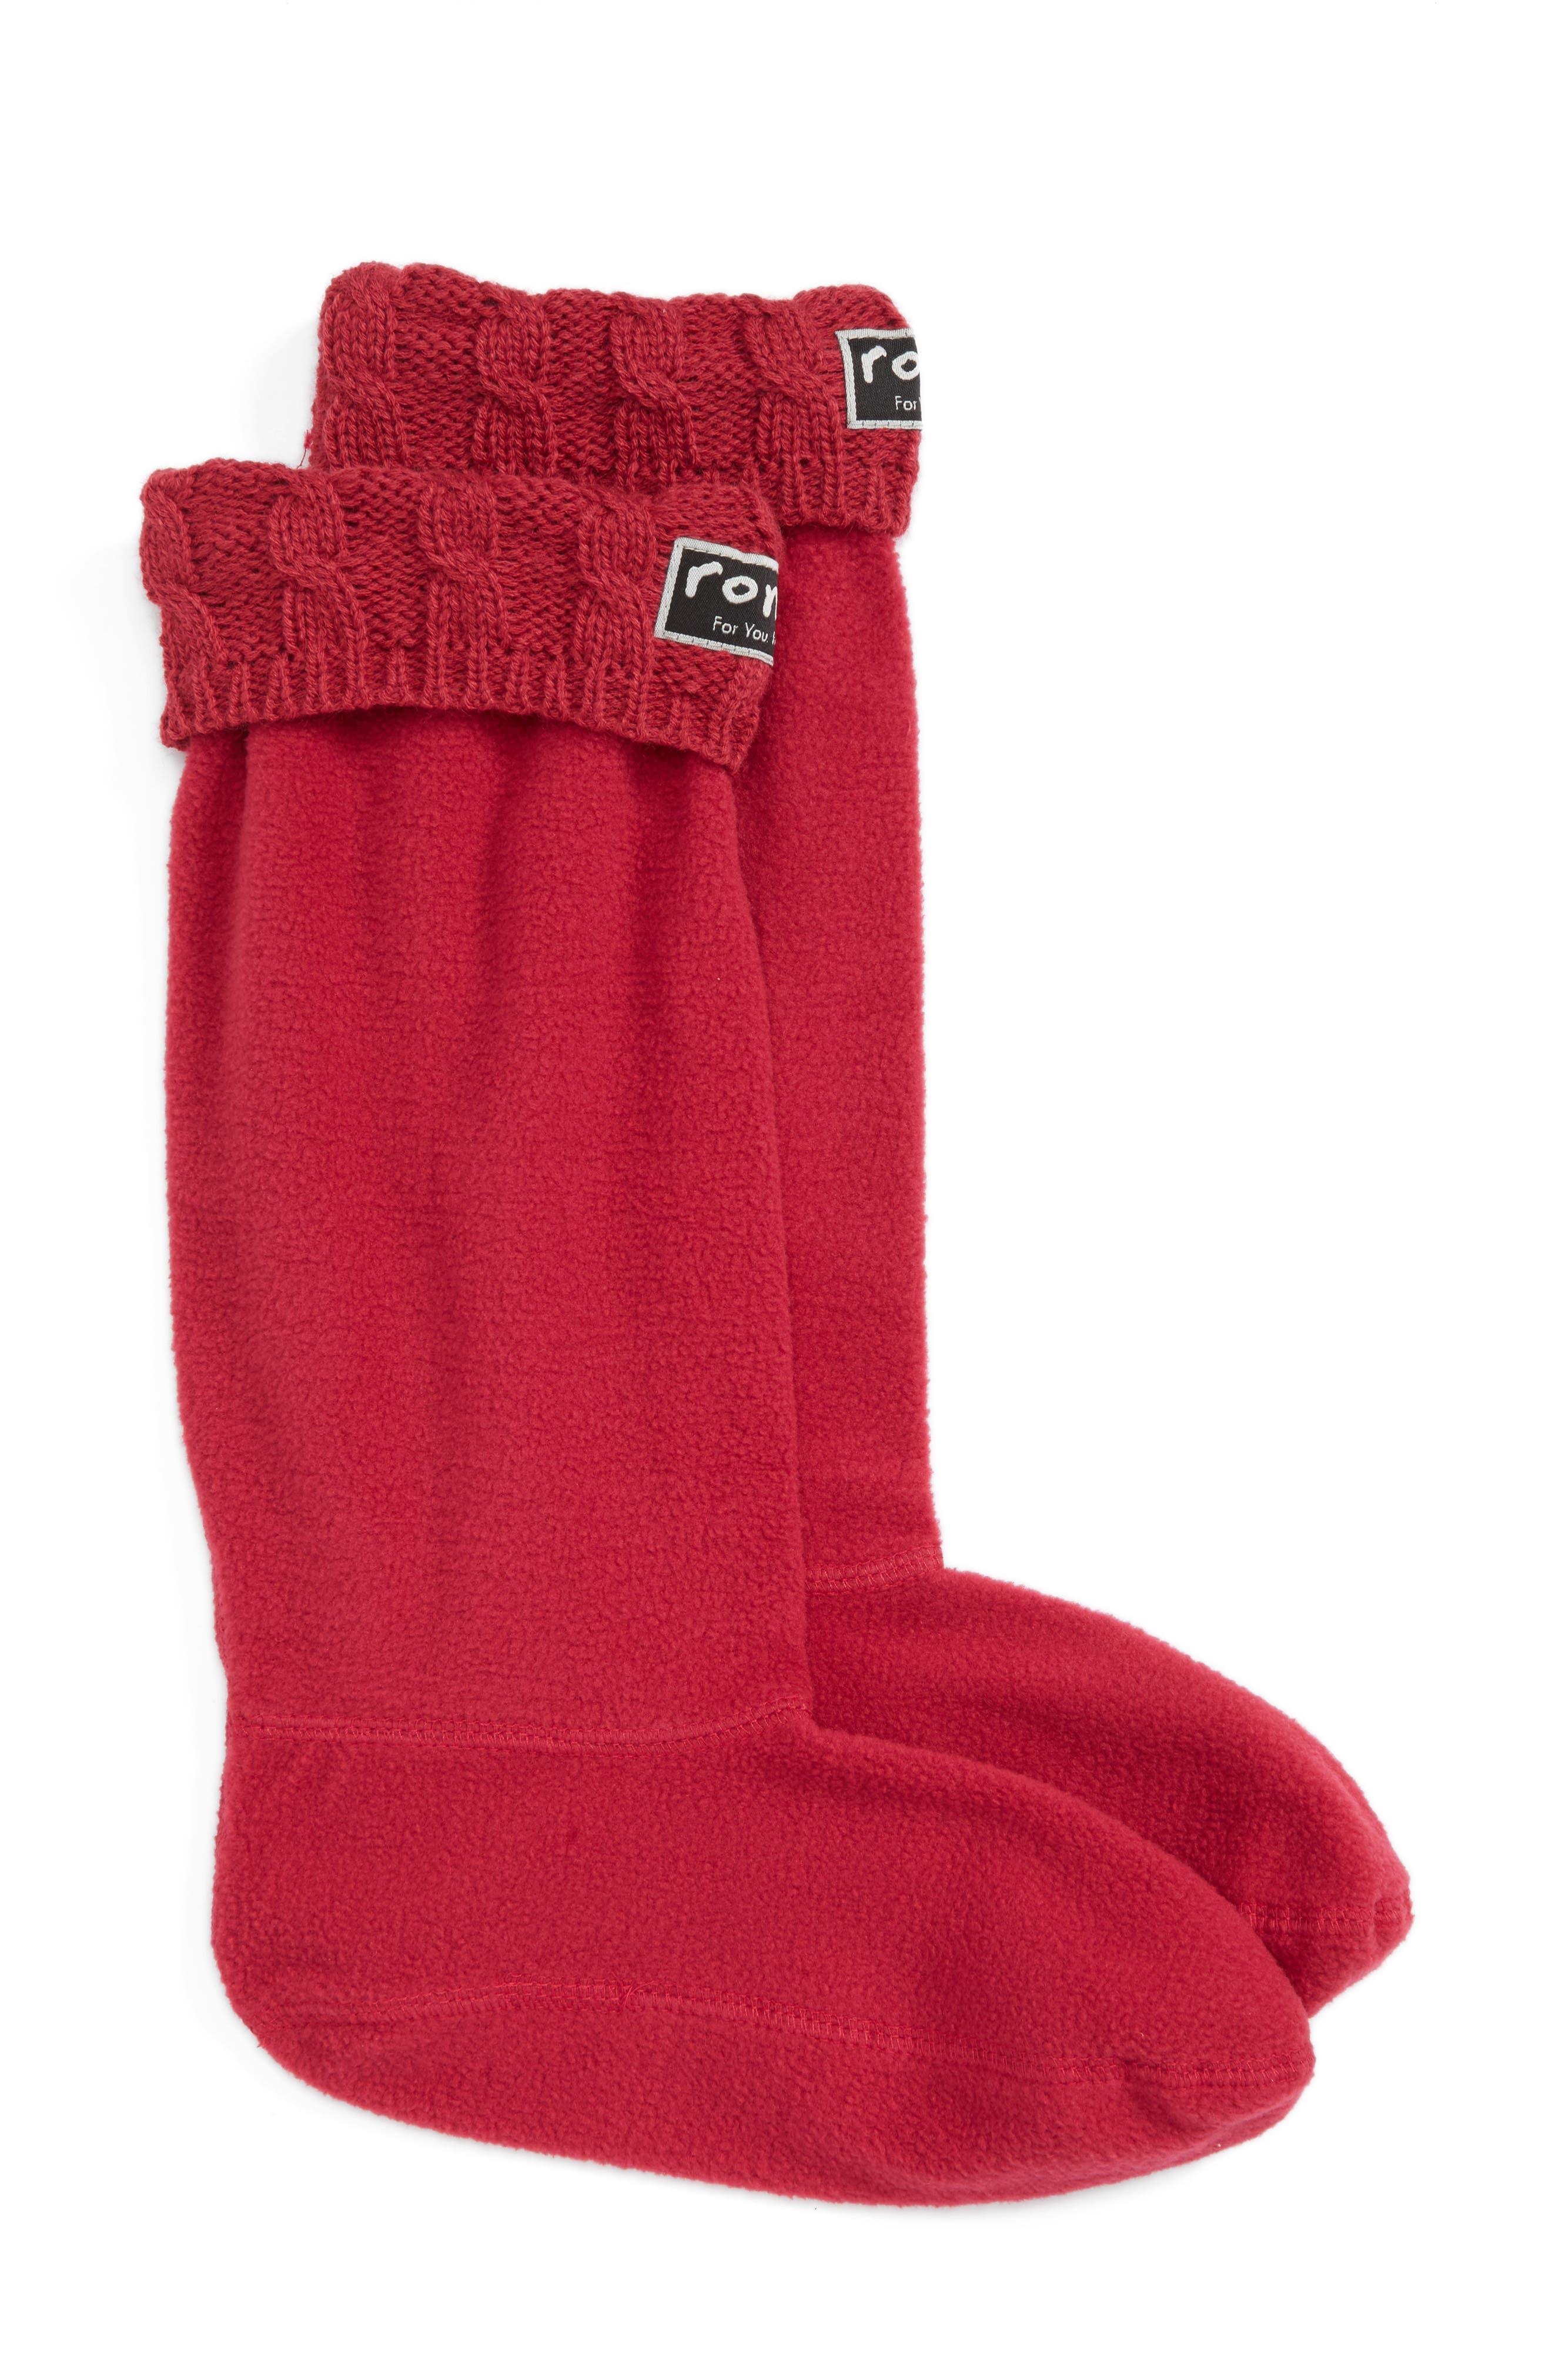 Alternate Image 1 Selected - roma Knit Collar Fleece Boot Socks (Women)